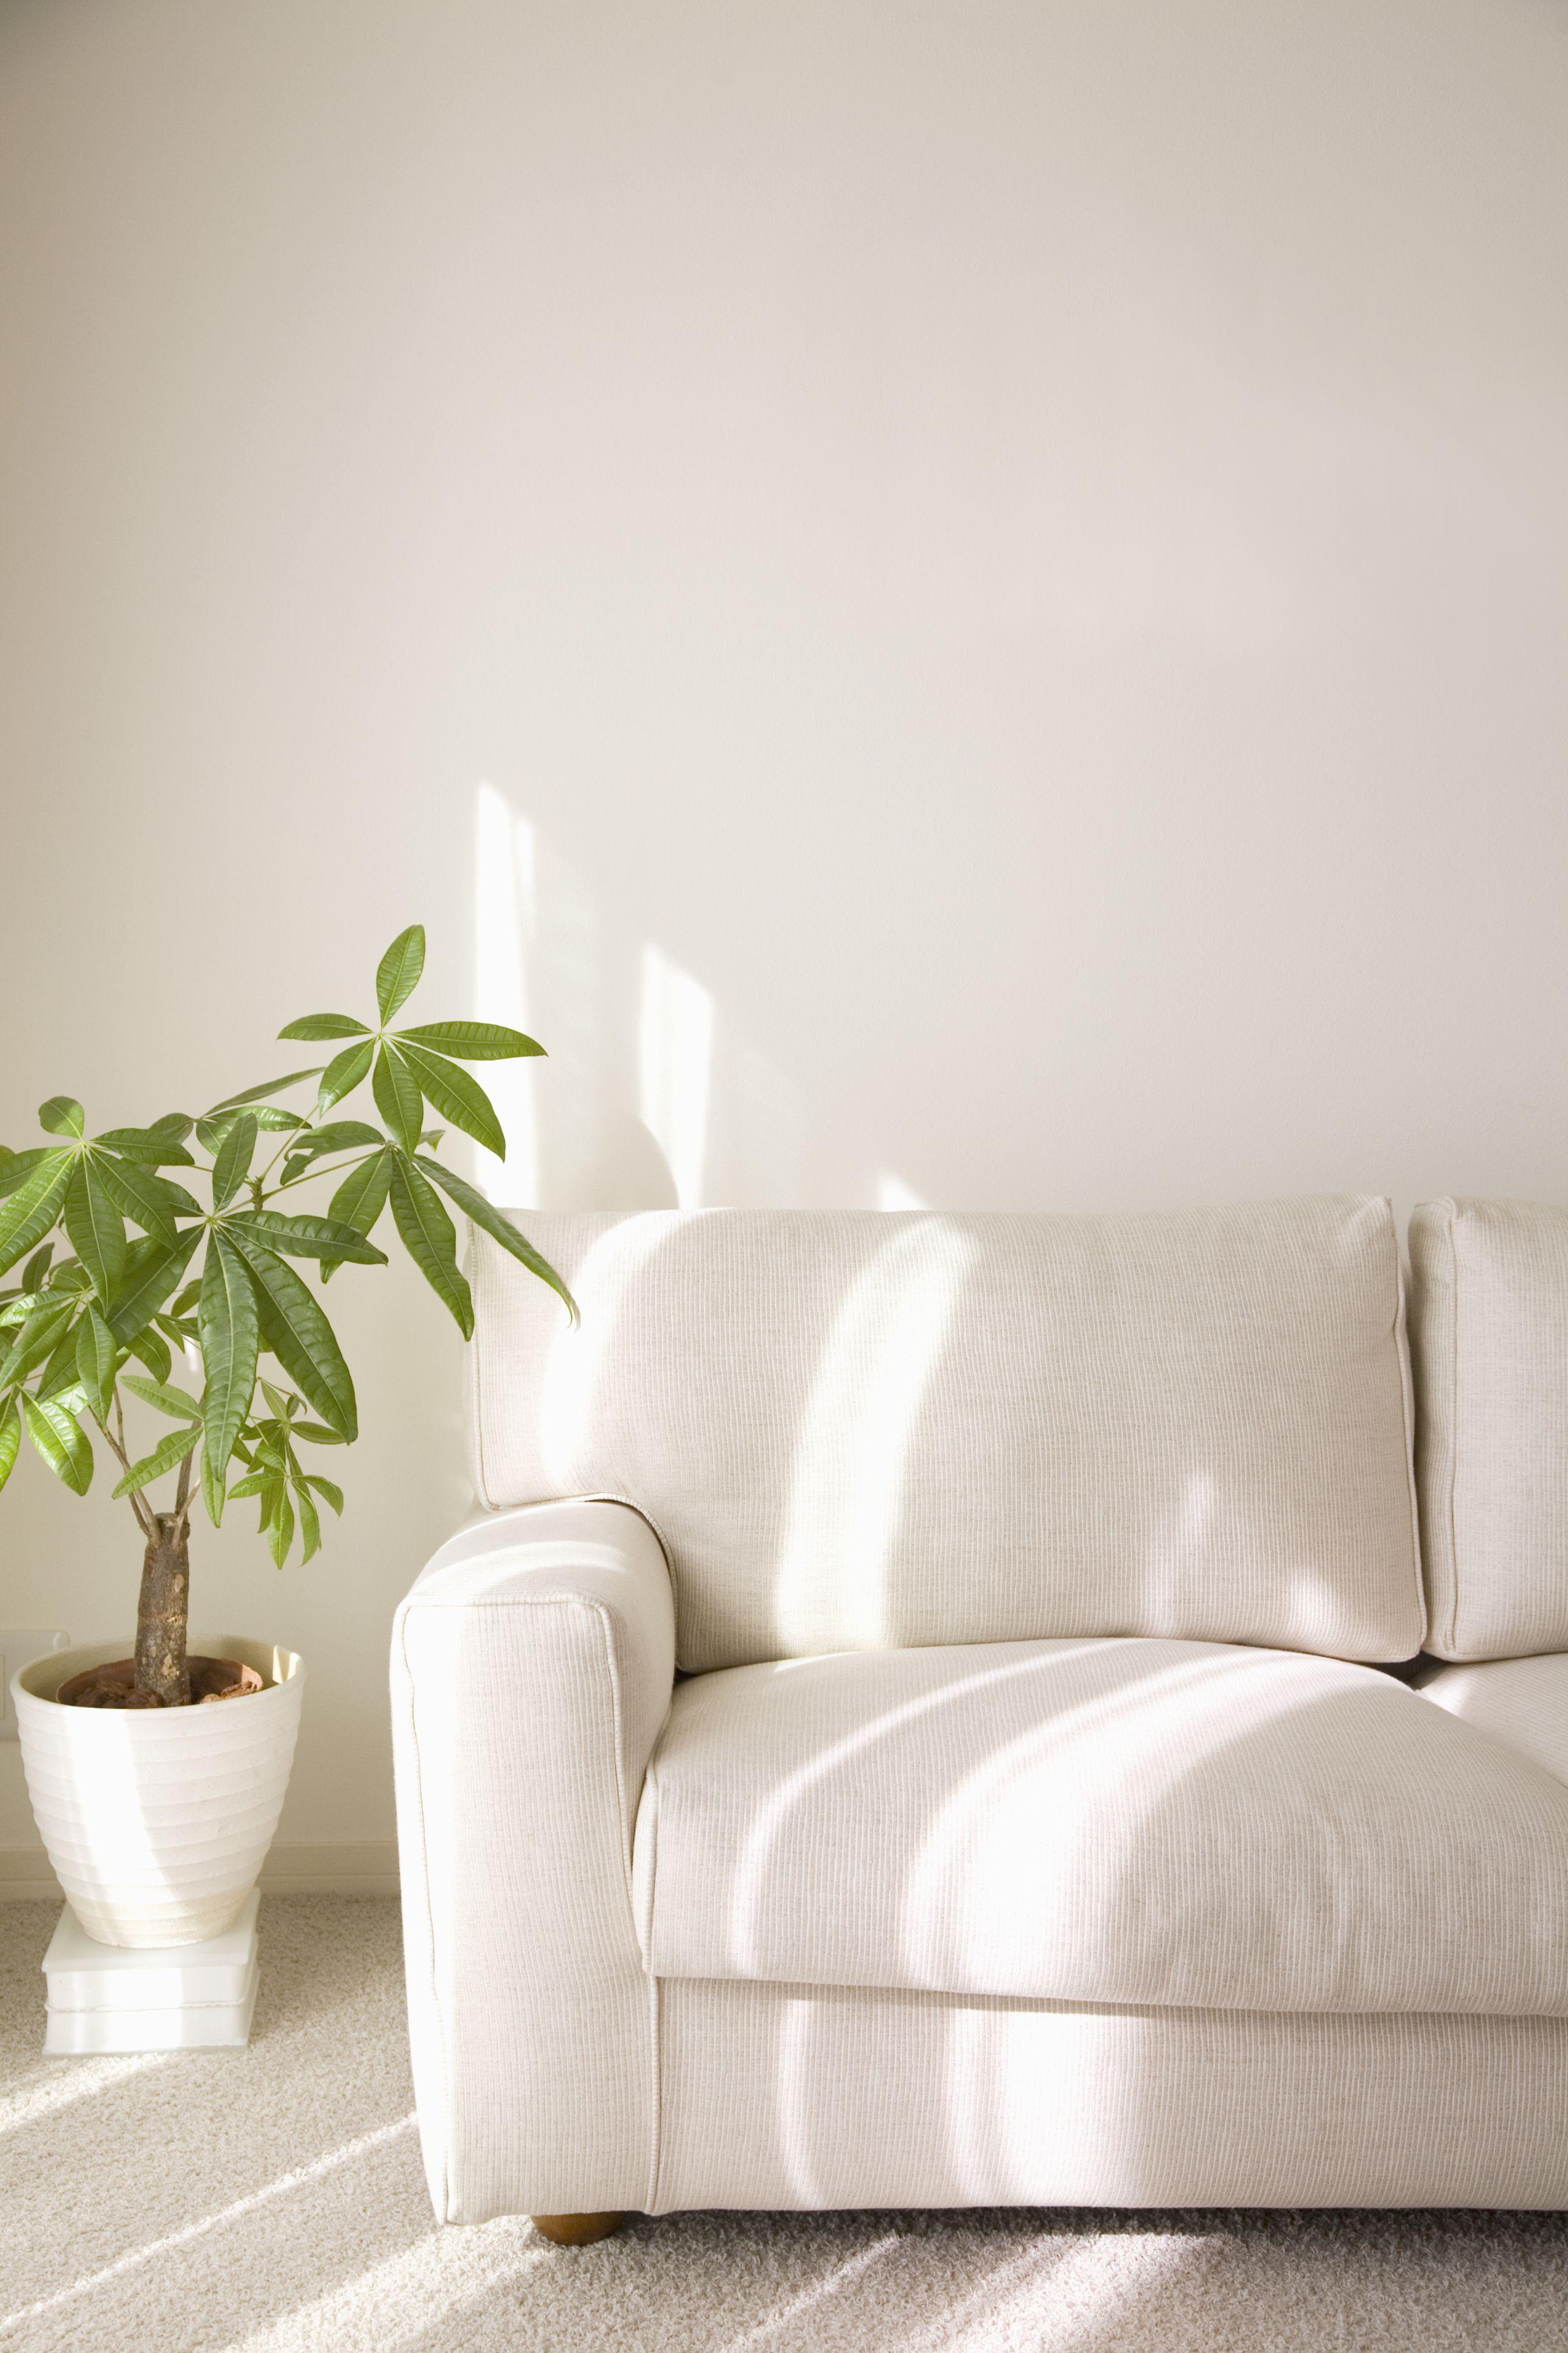 Sofa - Upholstery - Santa Maria, CA